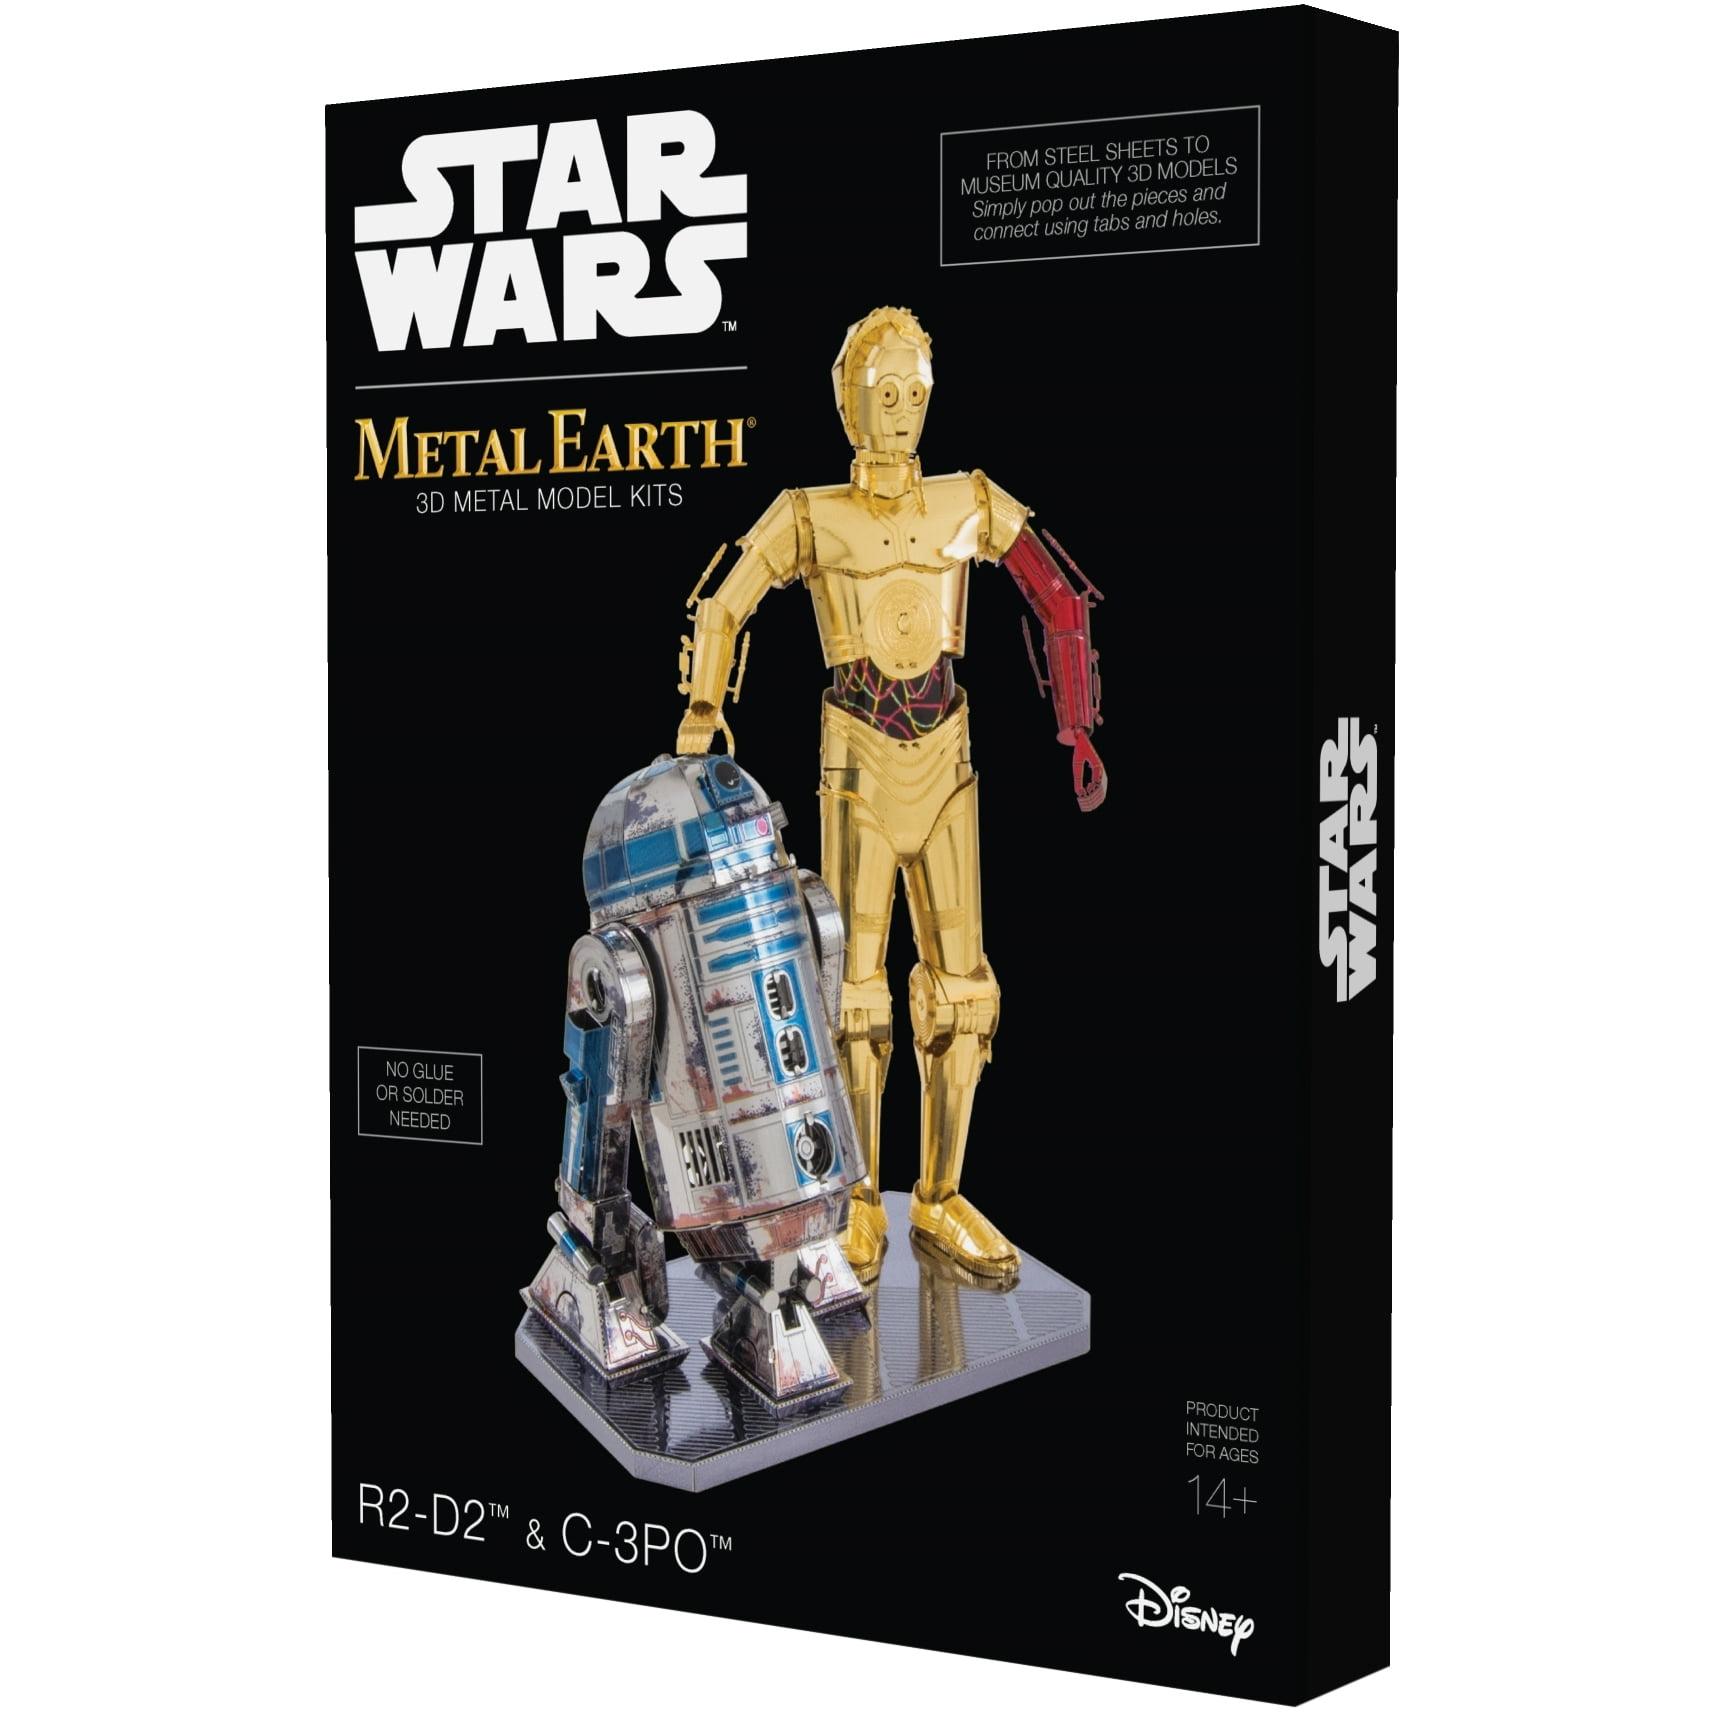 Metal Earth 3D Metal Model Kit Star Wars R2-D2 & C-3PO Box Set by Fascinations